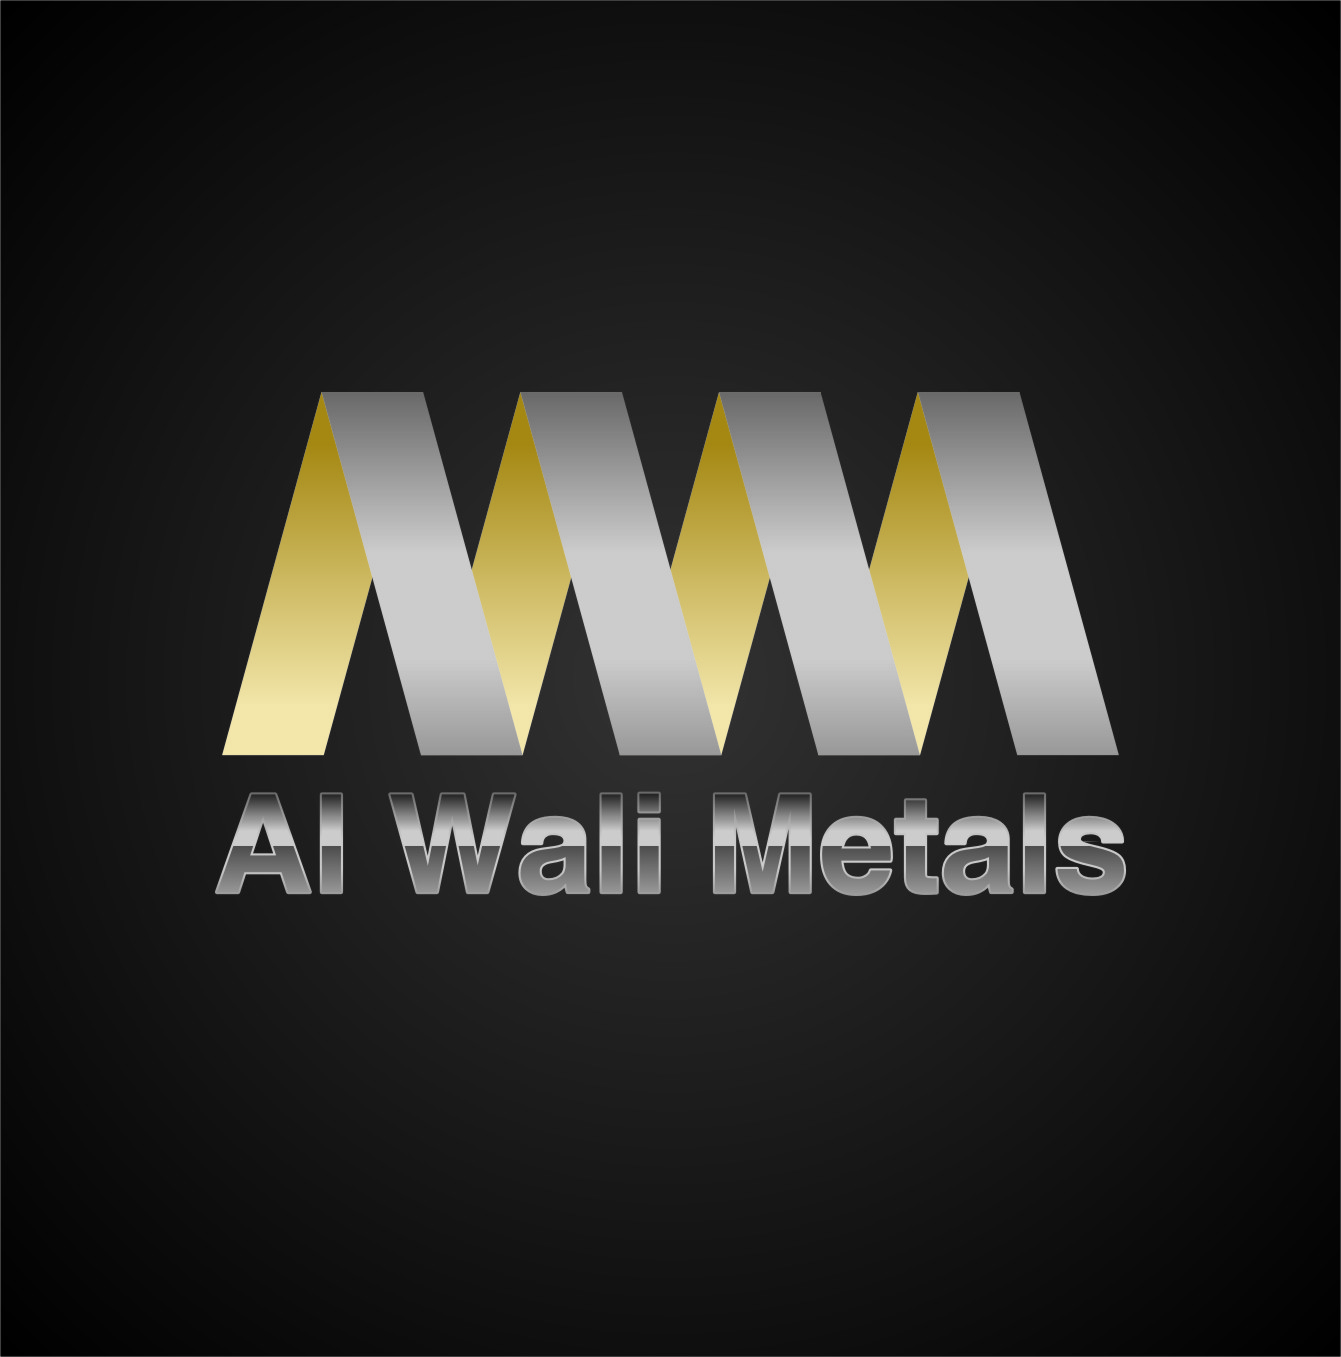 Logo Design by Ngepet_art - Entry No. 138 in the Logo Design Contest Inspiring Logo Design for Al Wali Metals.